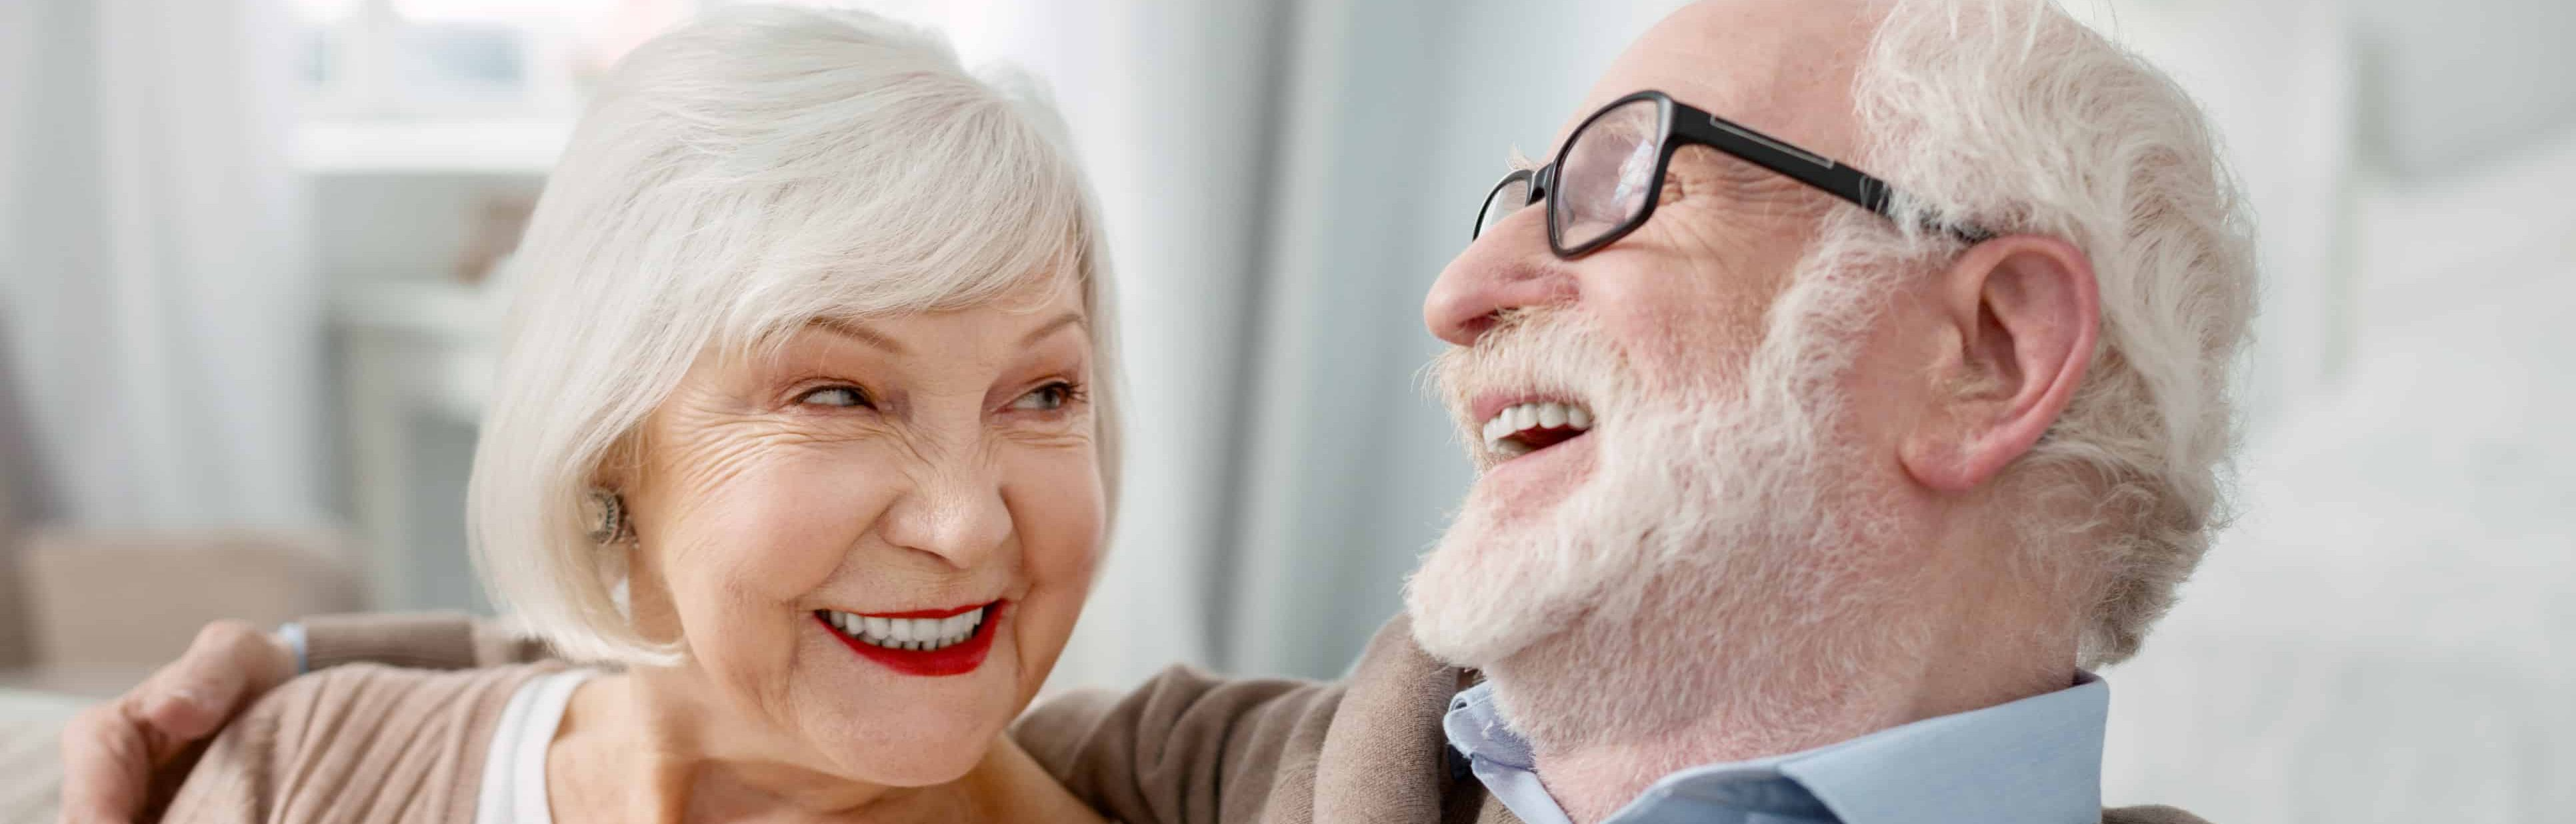 Cheerful elderly man hugging his wife